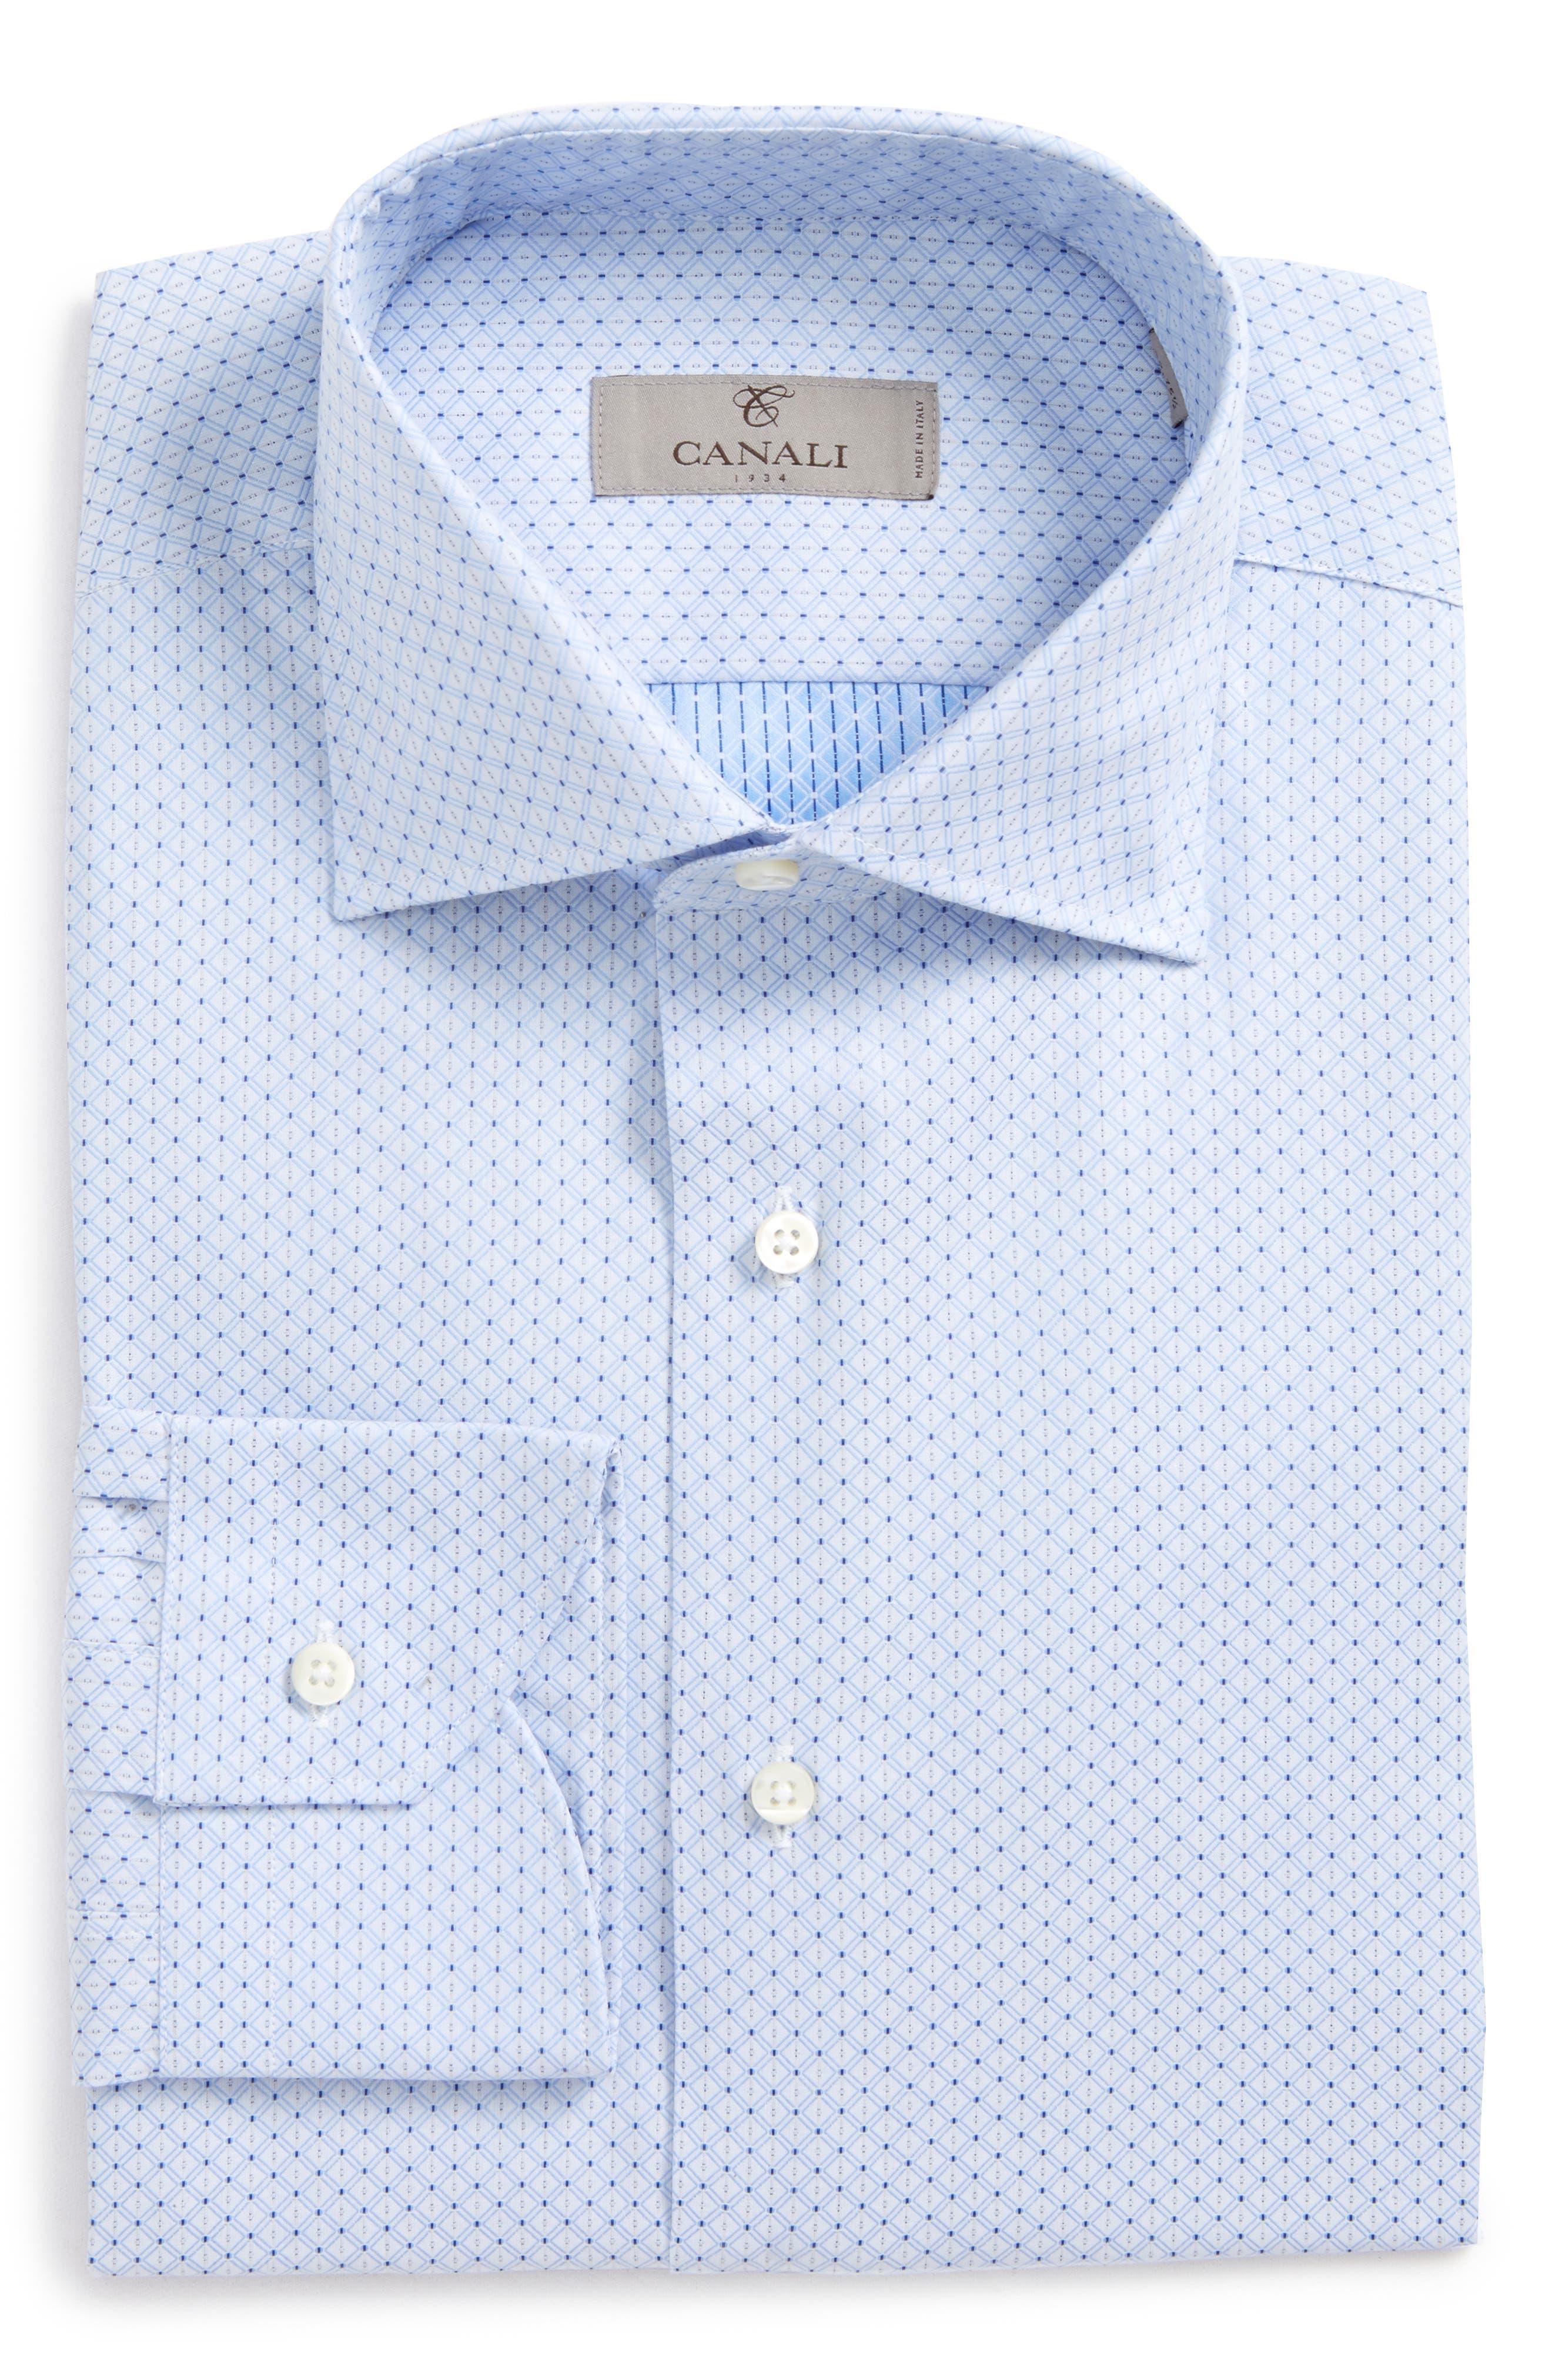 Regular Fit Geometric Dress Shirt,                         Main,                         color, Light Blue